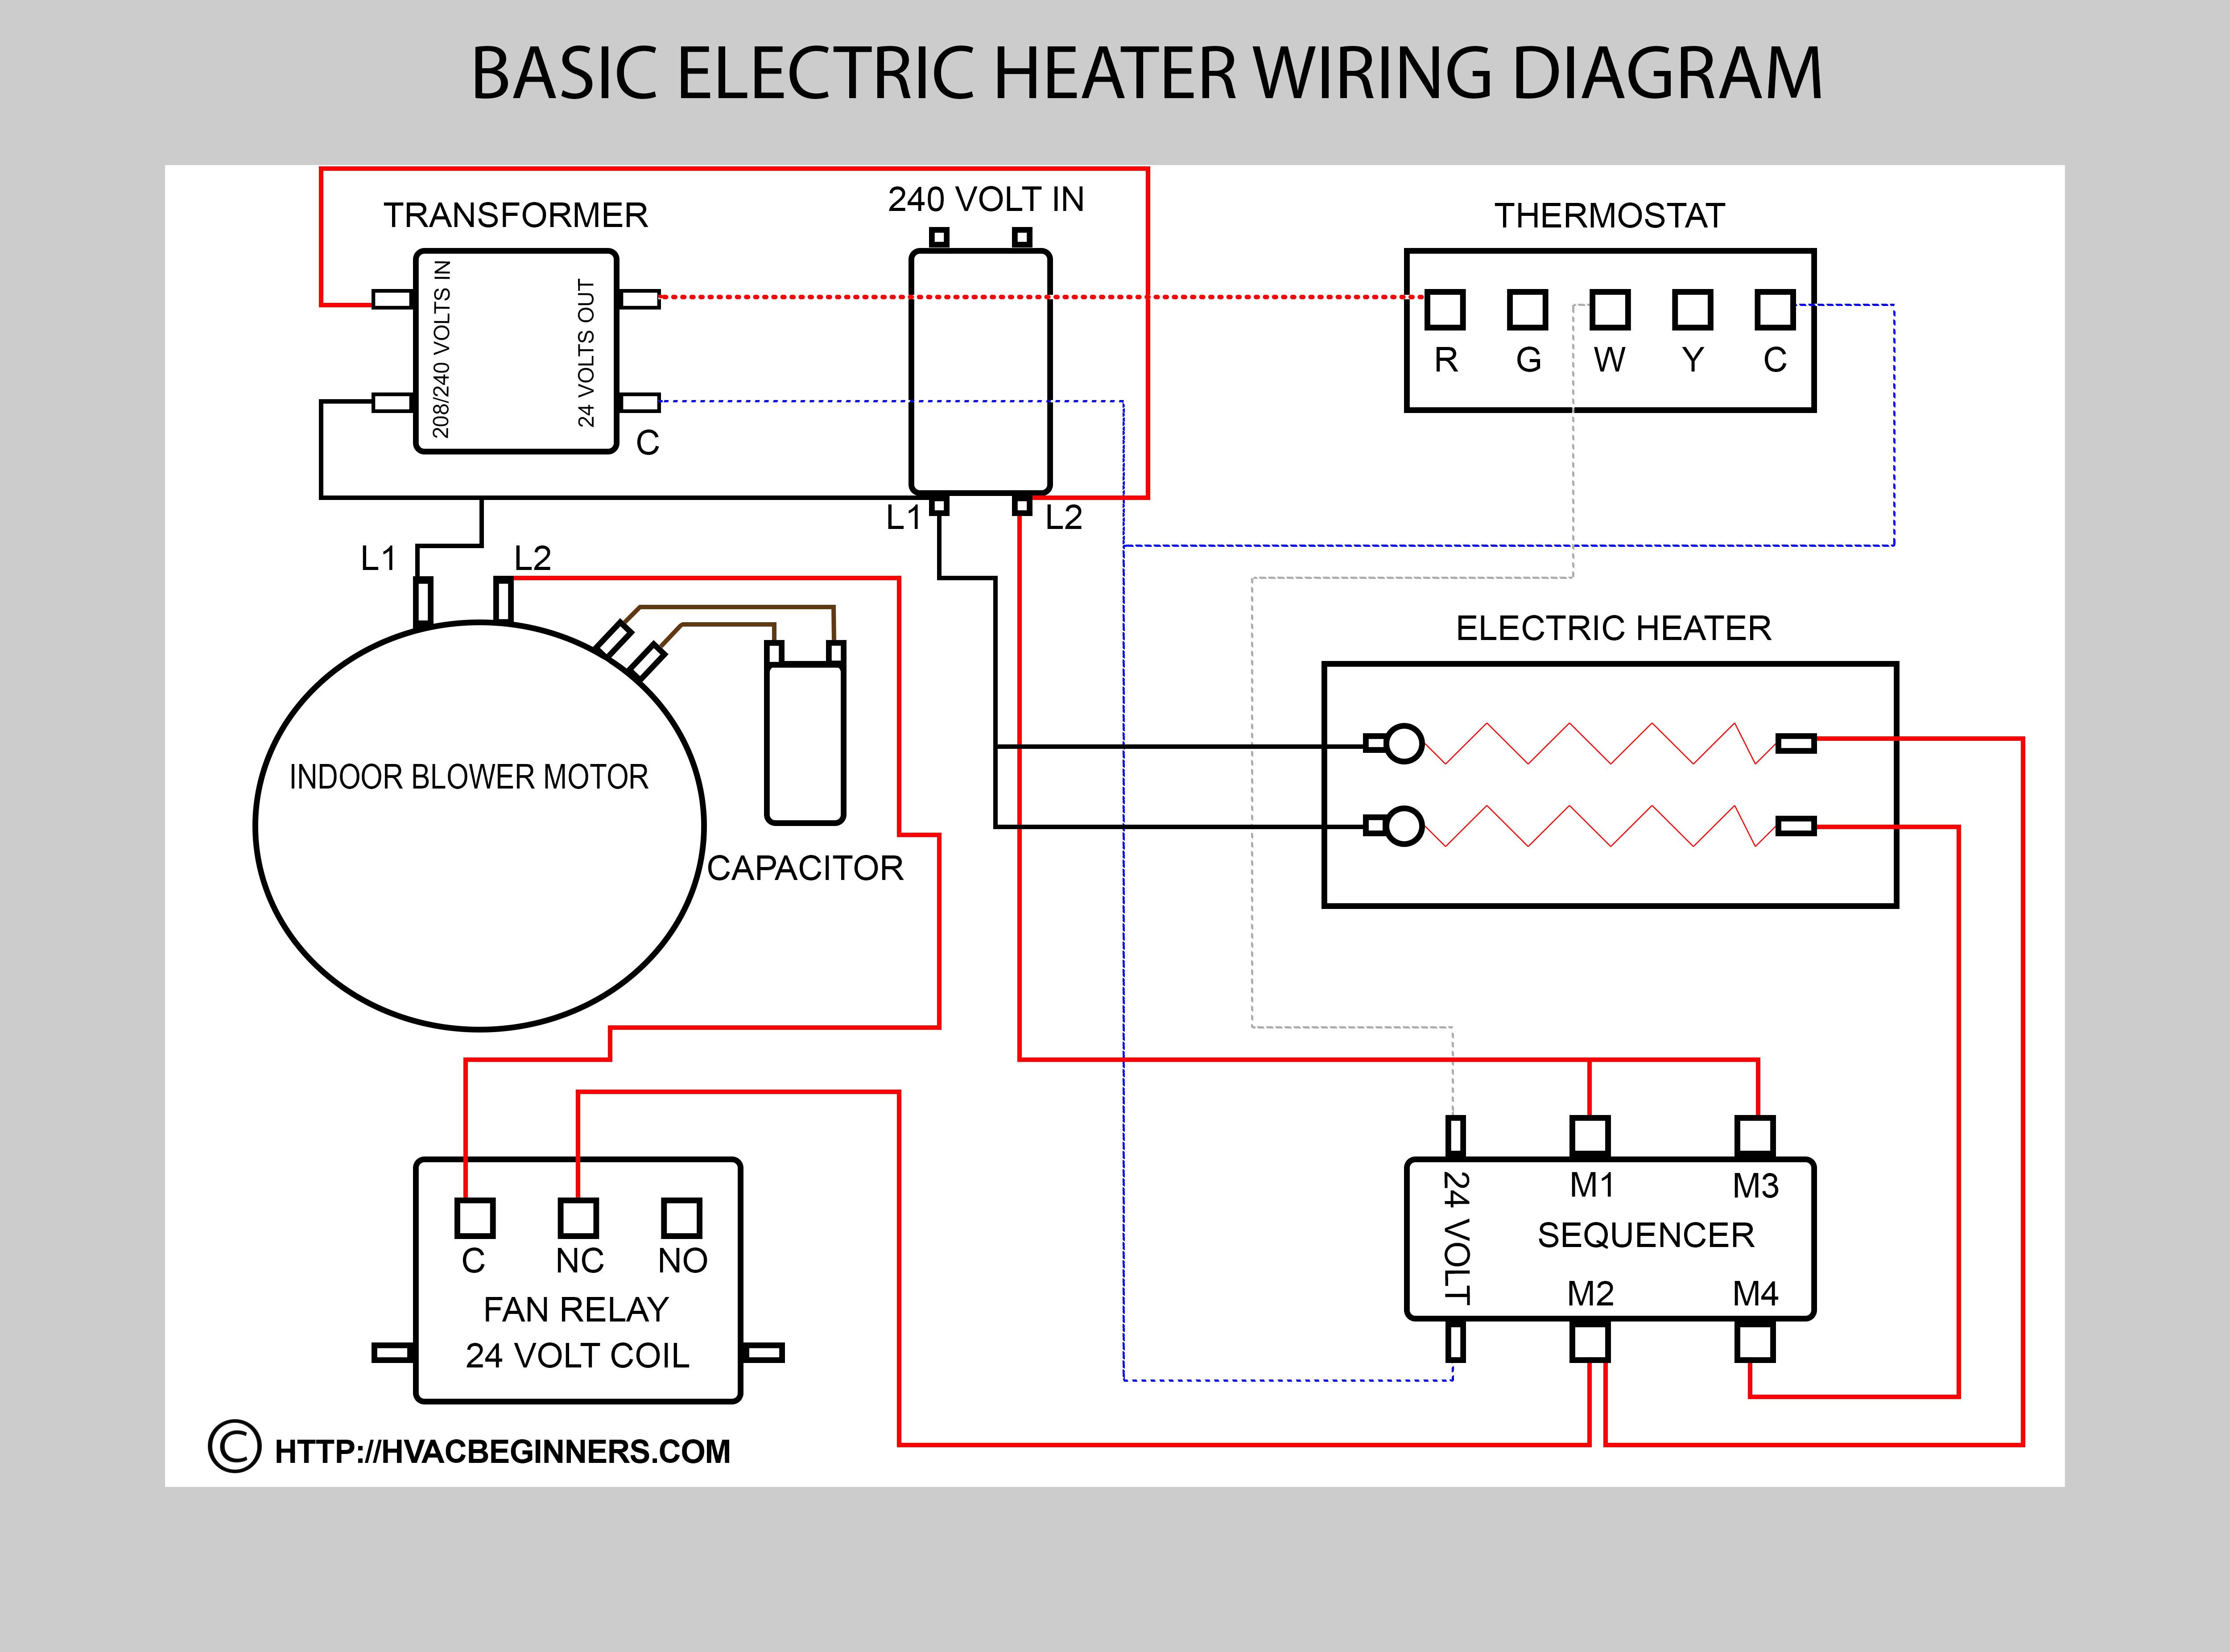 Electric Heater Wiring Diagram | Schematic Diagram - Electric Heater Wiring Diagram